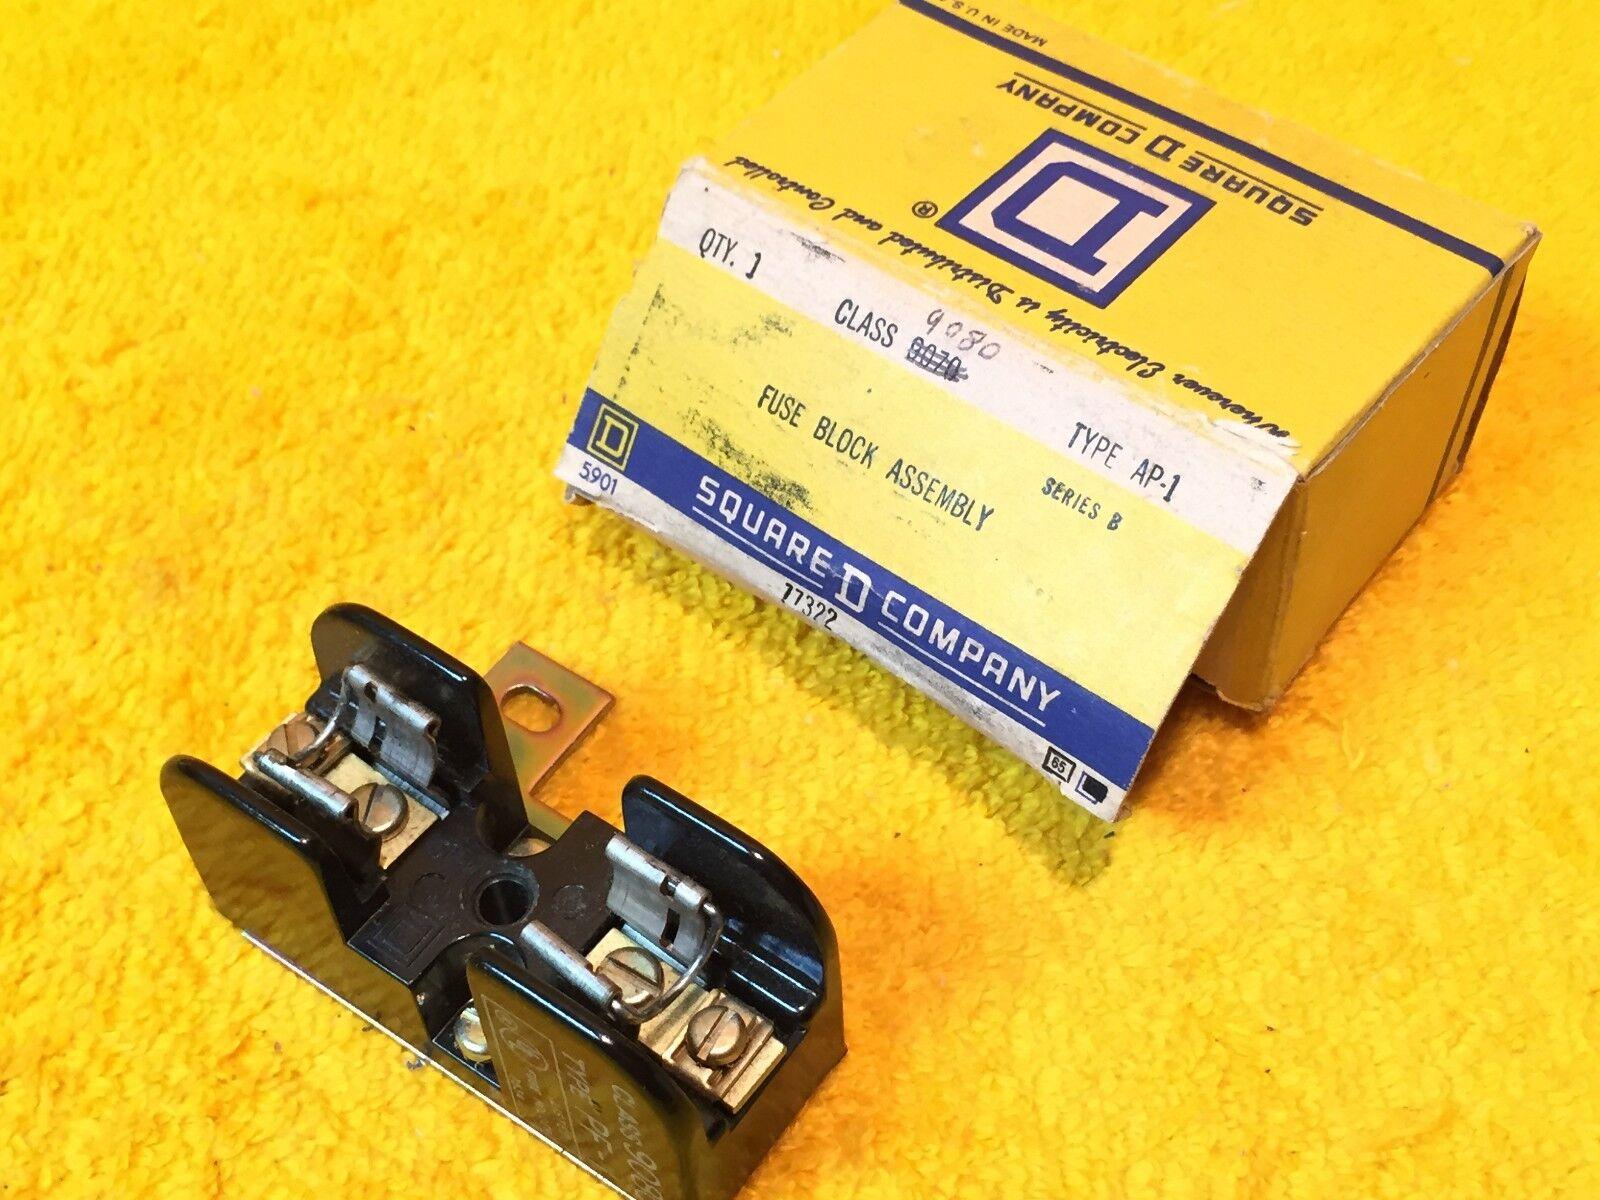 Square D Company Fuse Box Schematics Diagram Old Class 9080 Type Ap 1 30 Amp 250 Volt Pole Holder